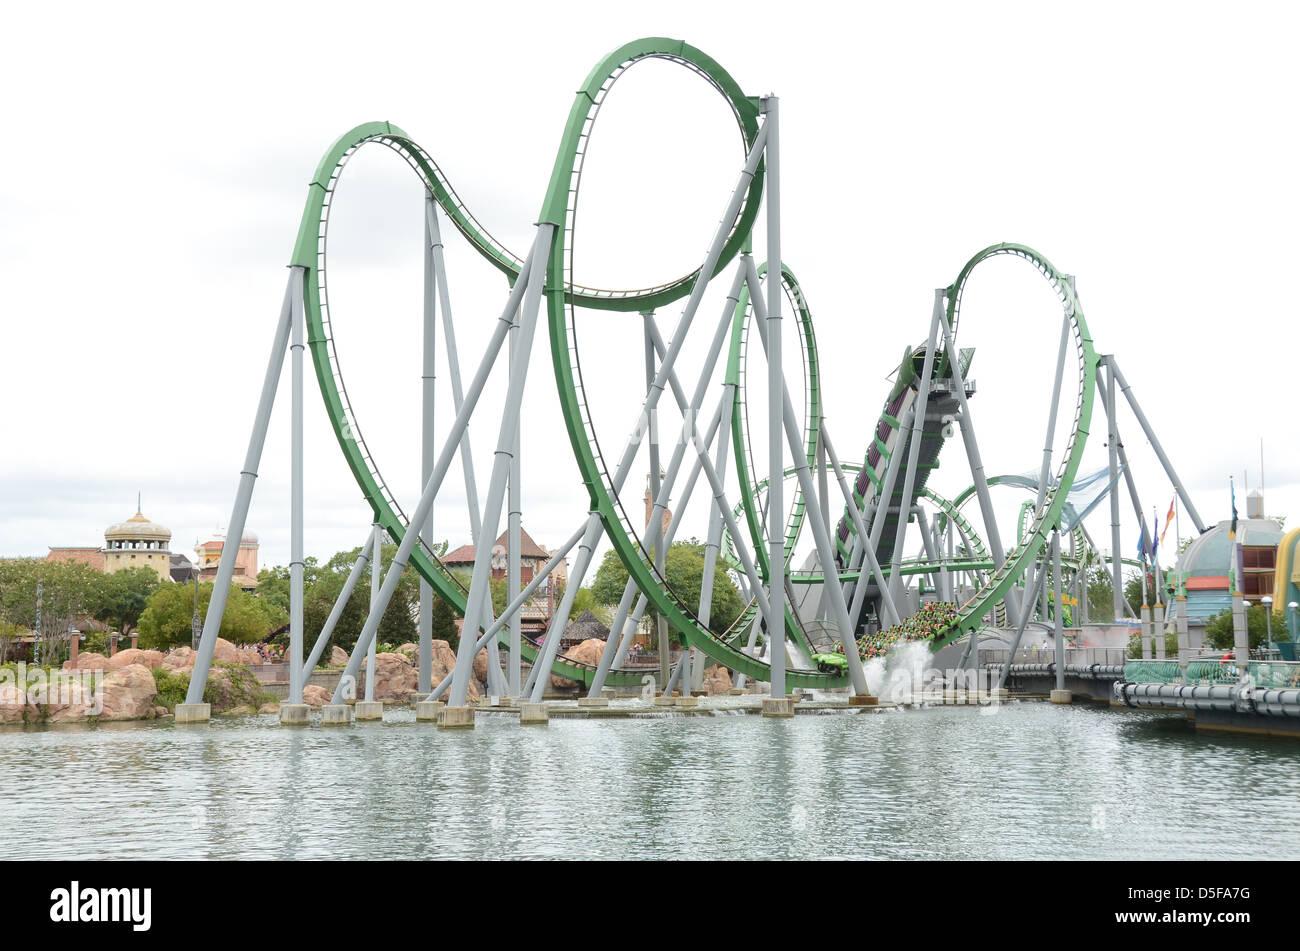 The Incredible Hulk Ride At Universal Studio S Islands Of Adventure Orlando Florida Stock Photo Alamy